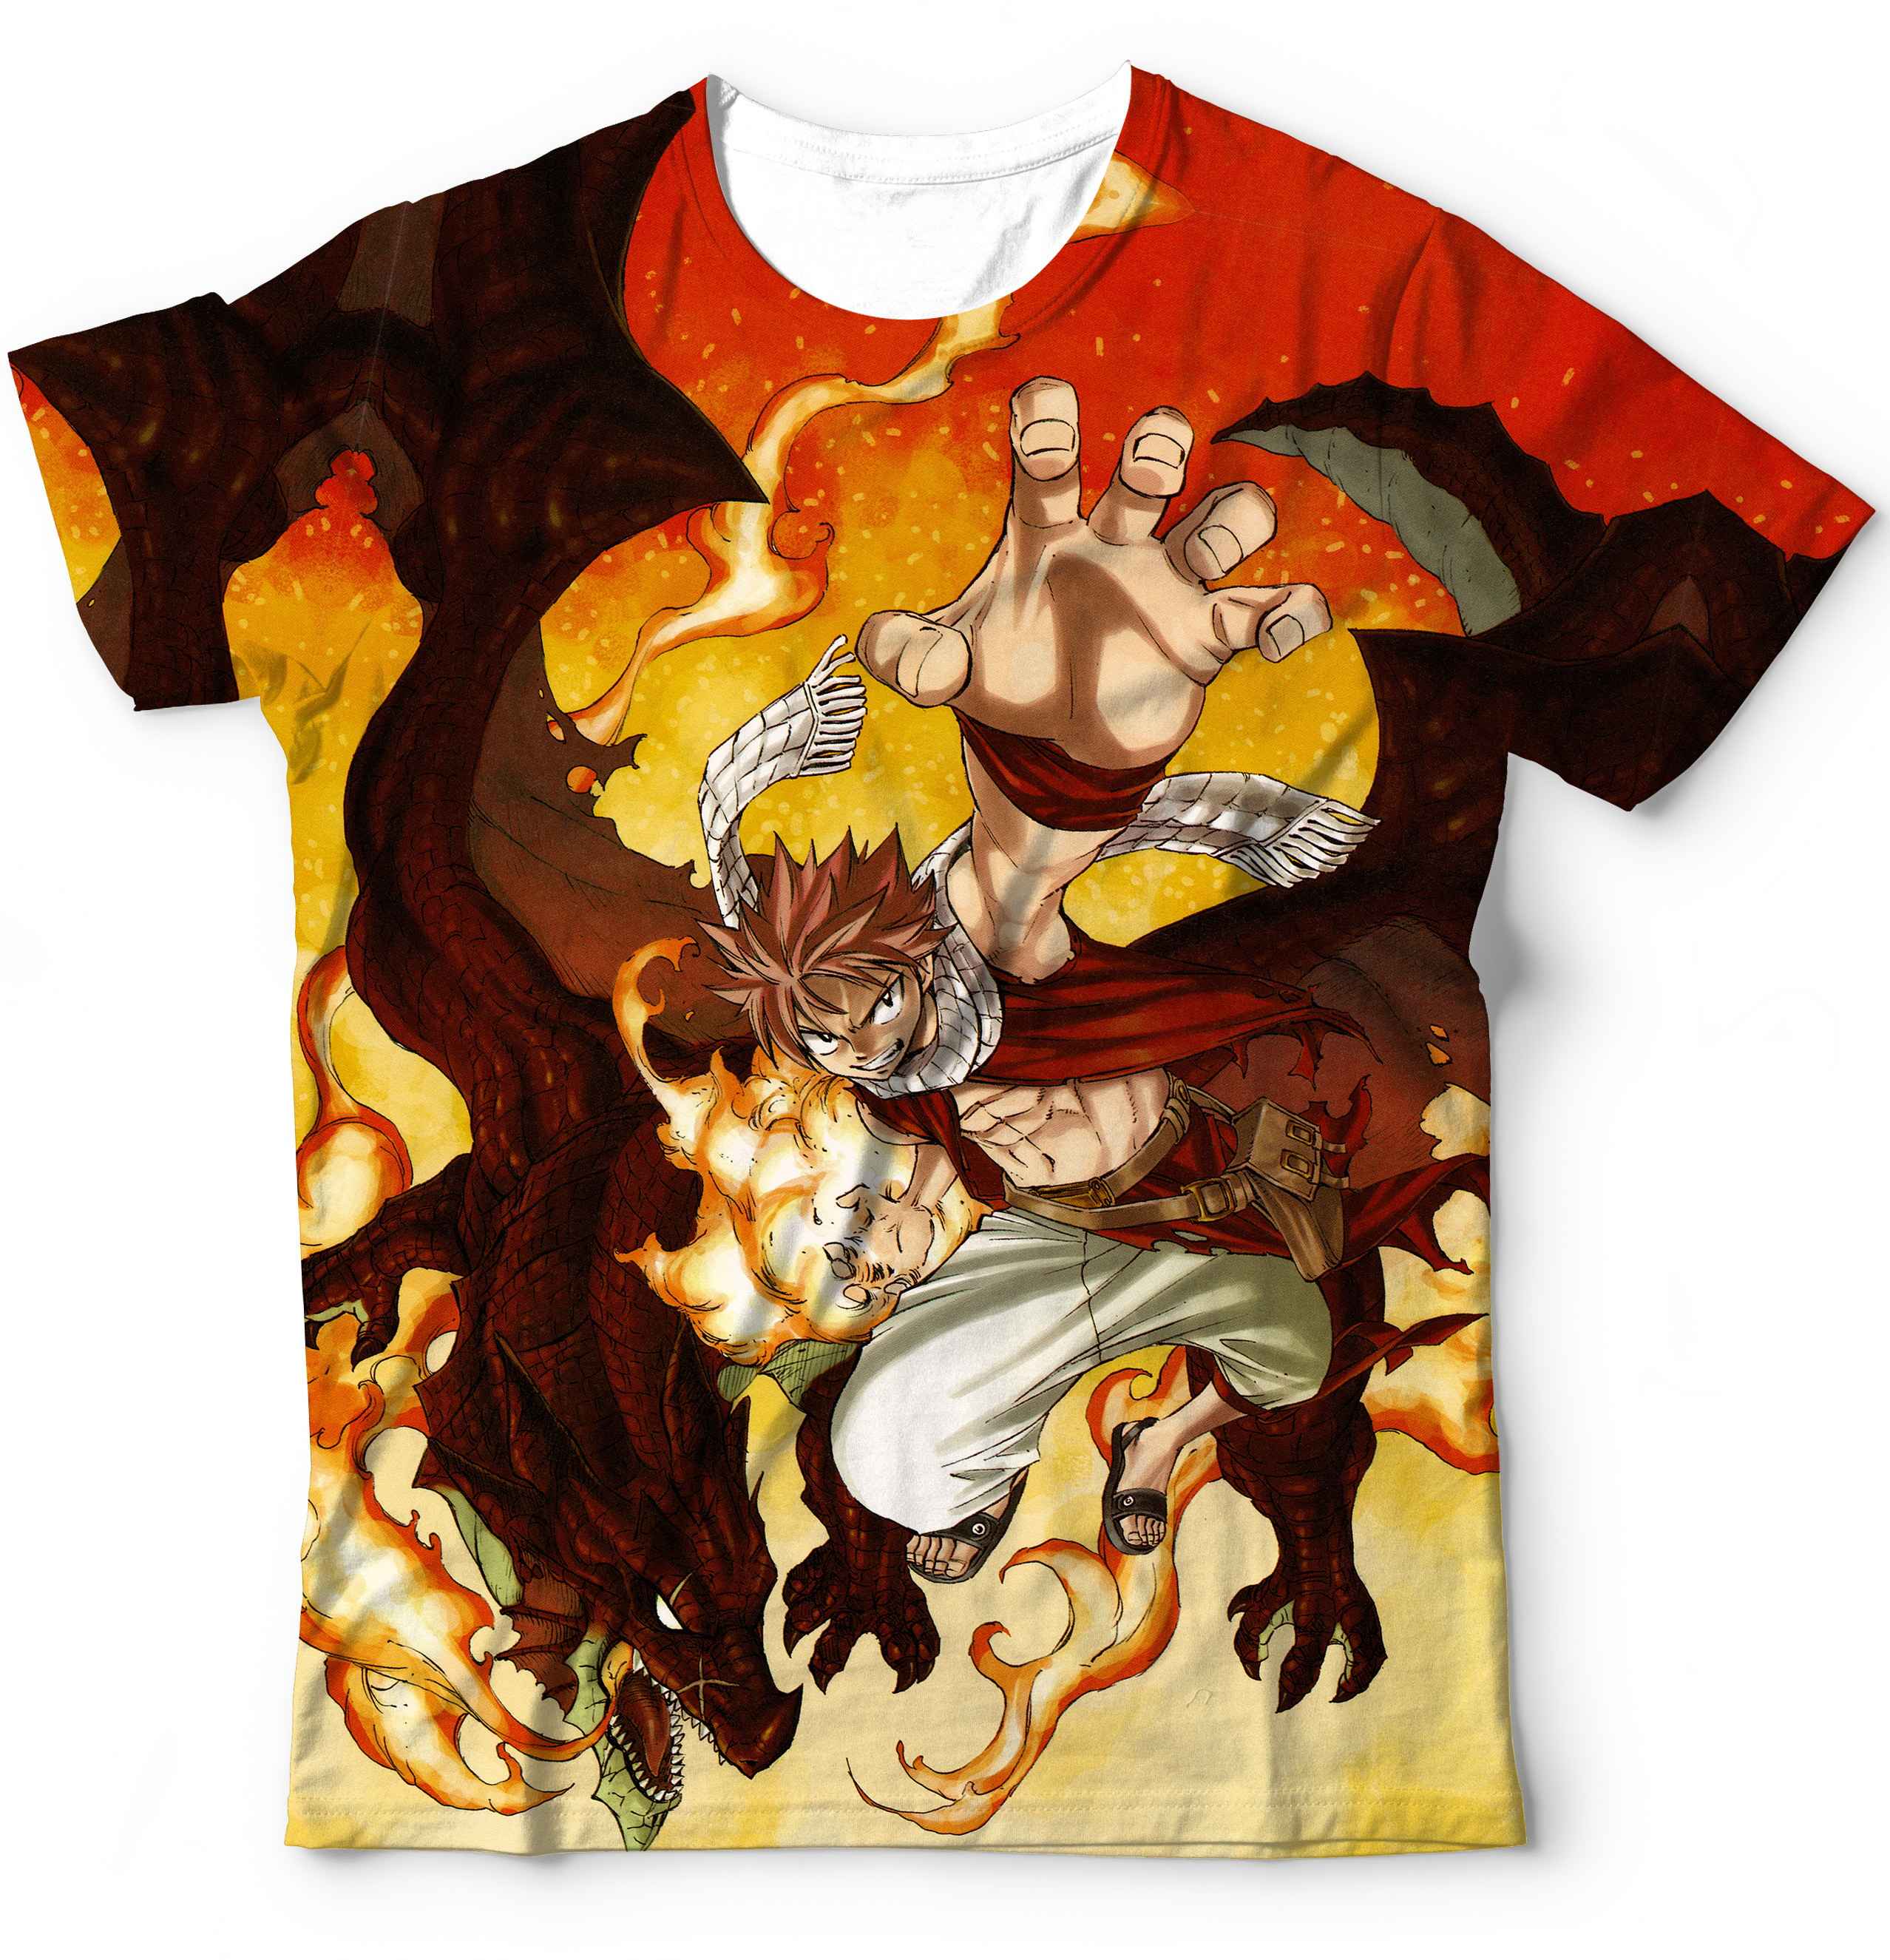 56ec28b1ed3c3 Blusa Camiseta Camisa Fairy Tail Natsu - Estampada no Elo7 ...